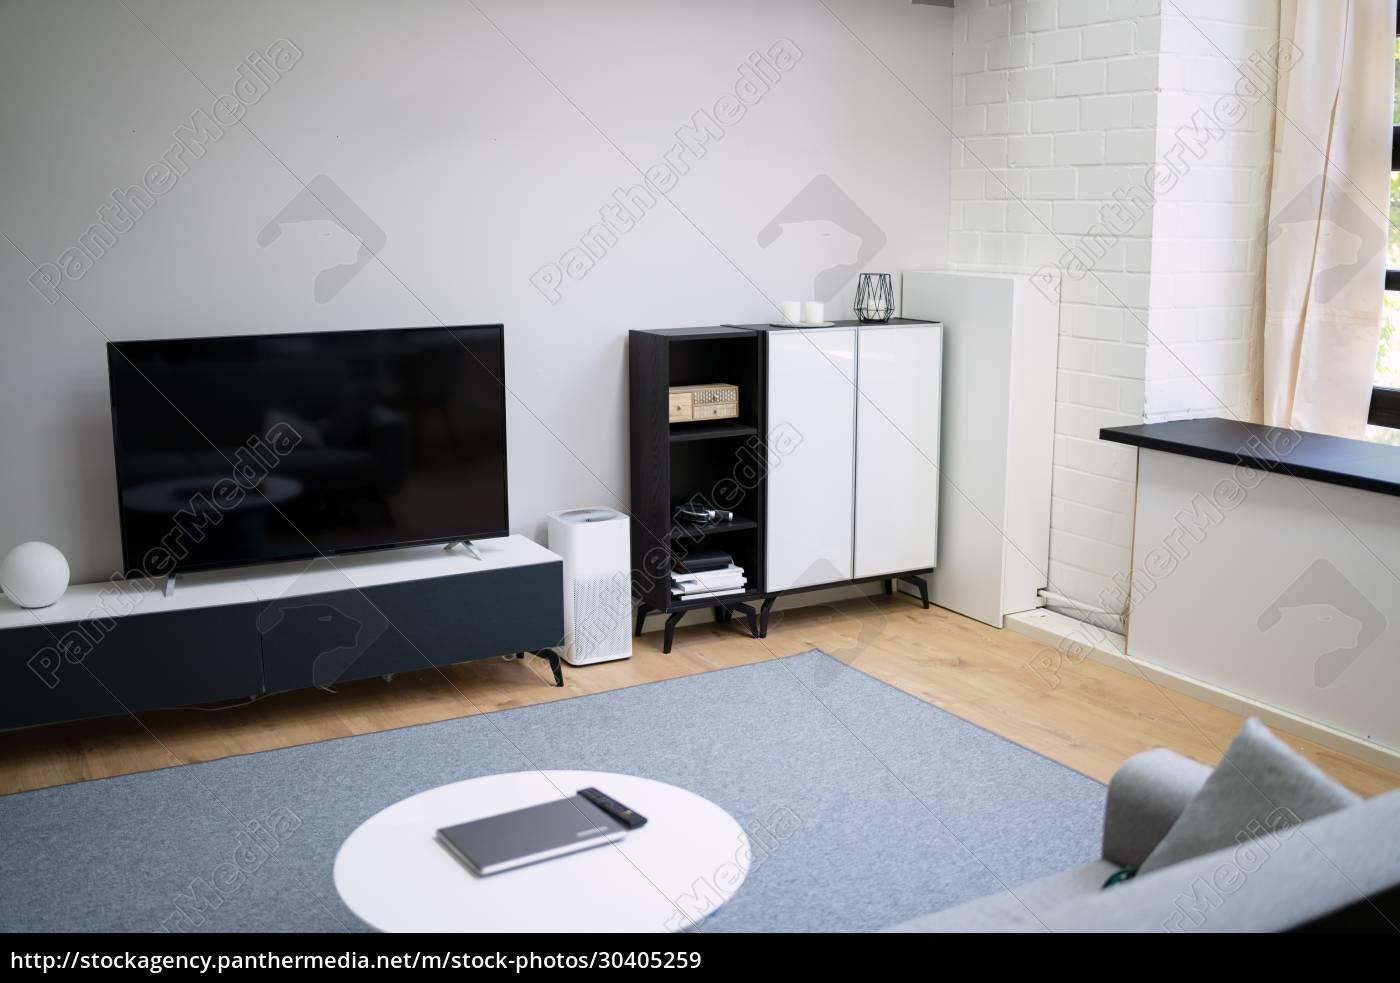 living, room, interior, with, wooden, floor - 30405259